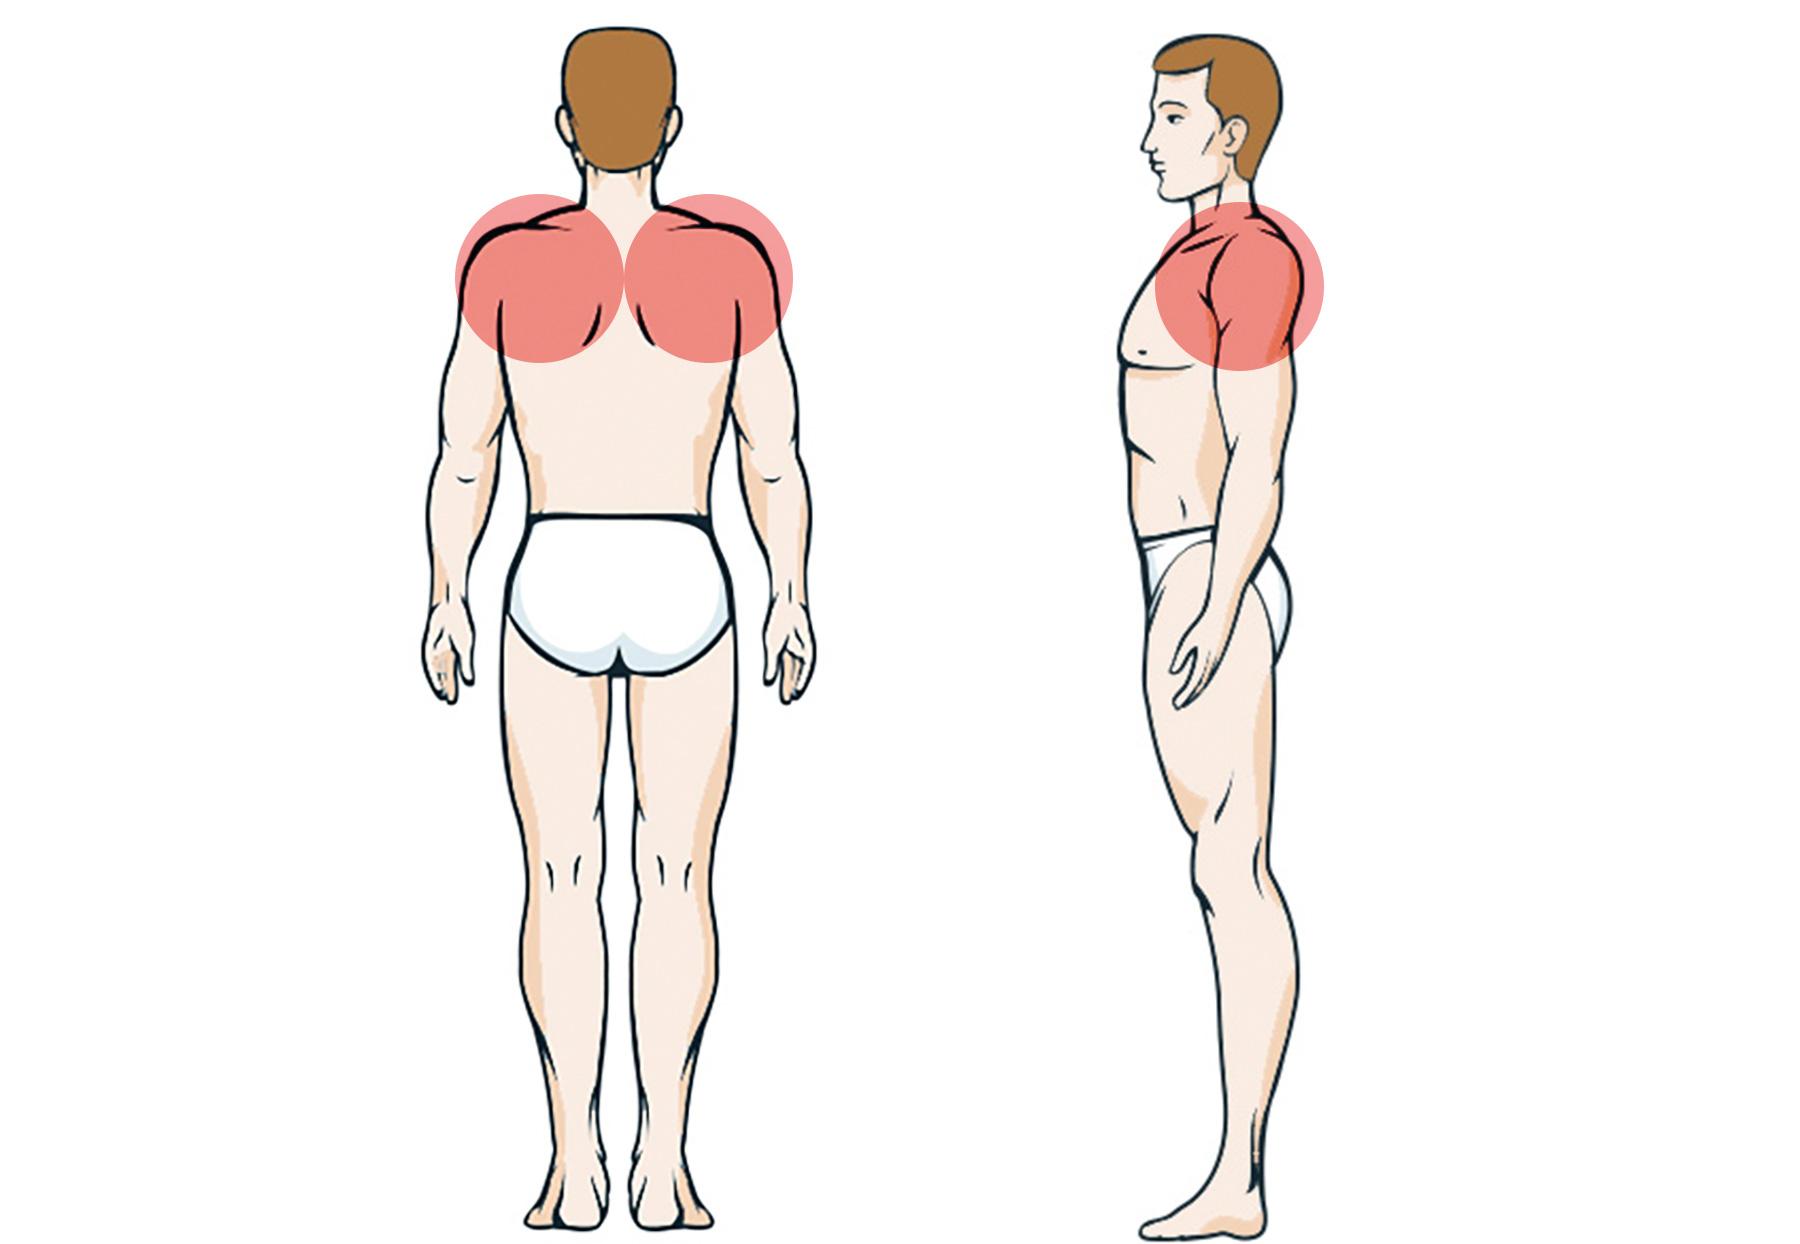 Schulterblatt schmerzen neben Schulter schmerzen